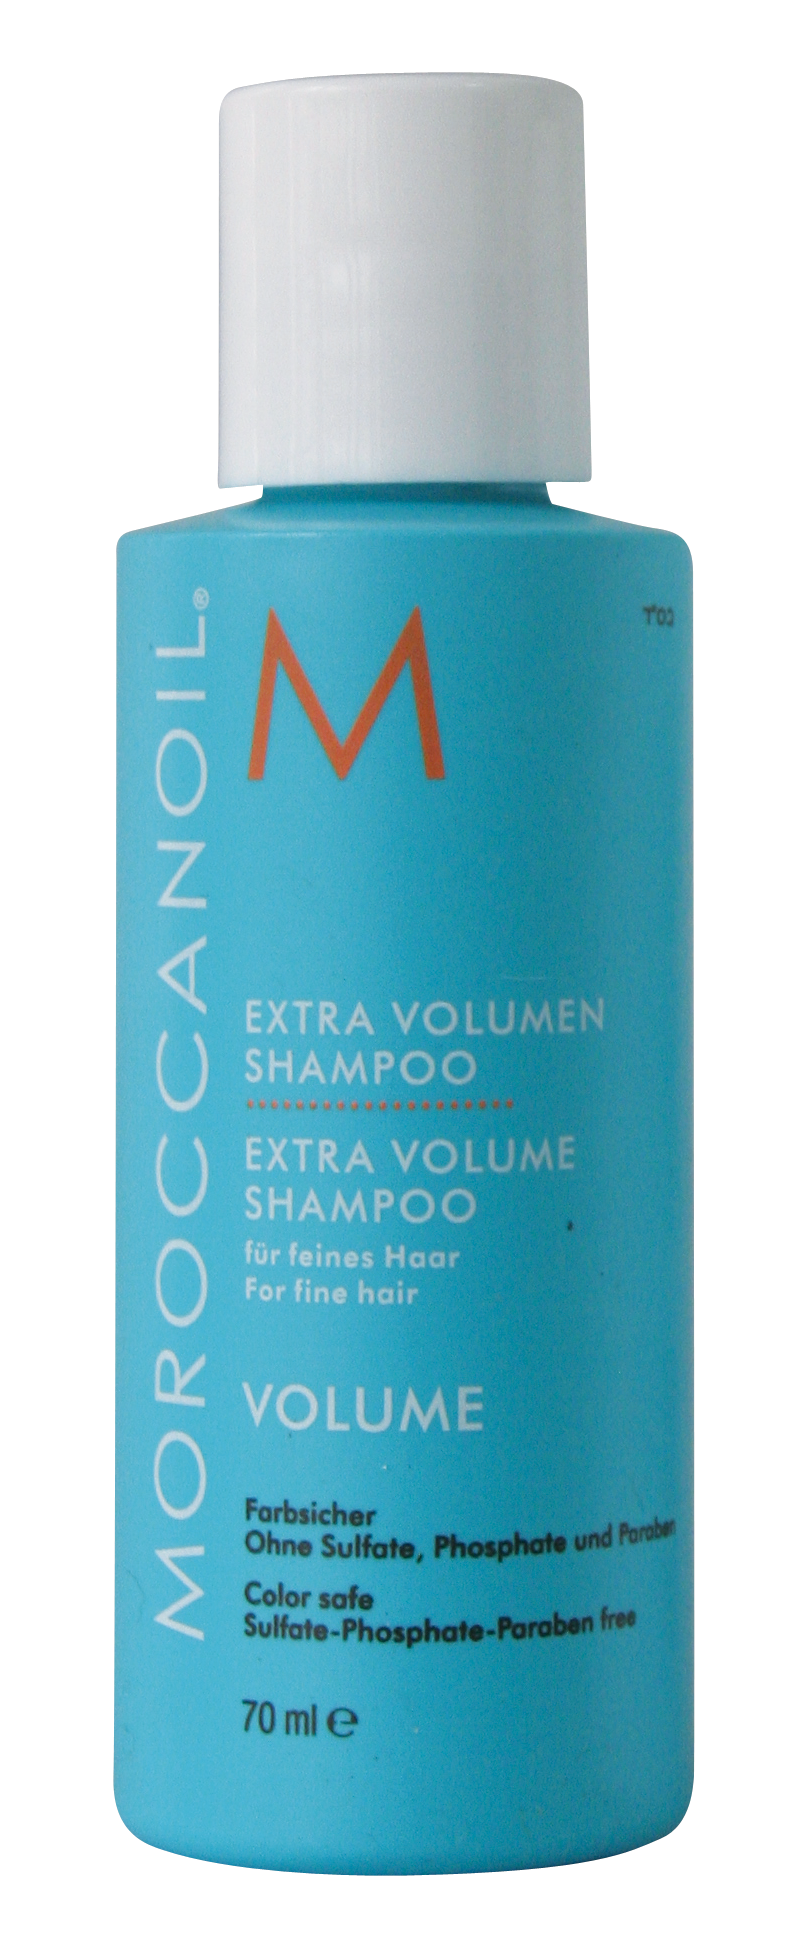 Moroccanoil Extra Volumen Shampoo 70ml